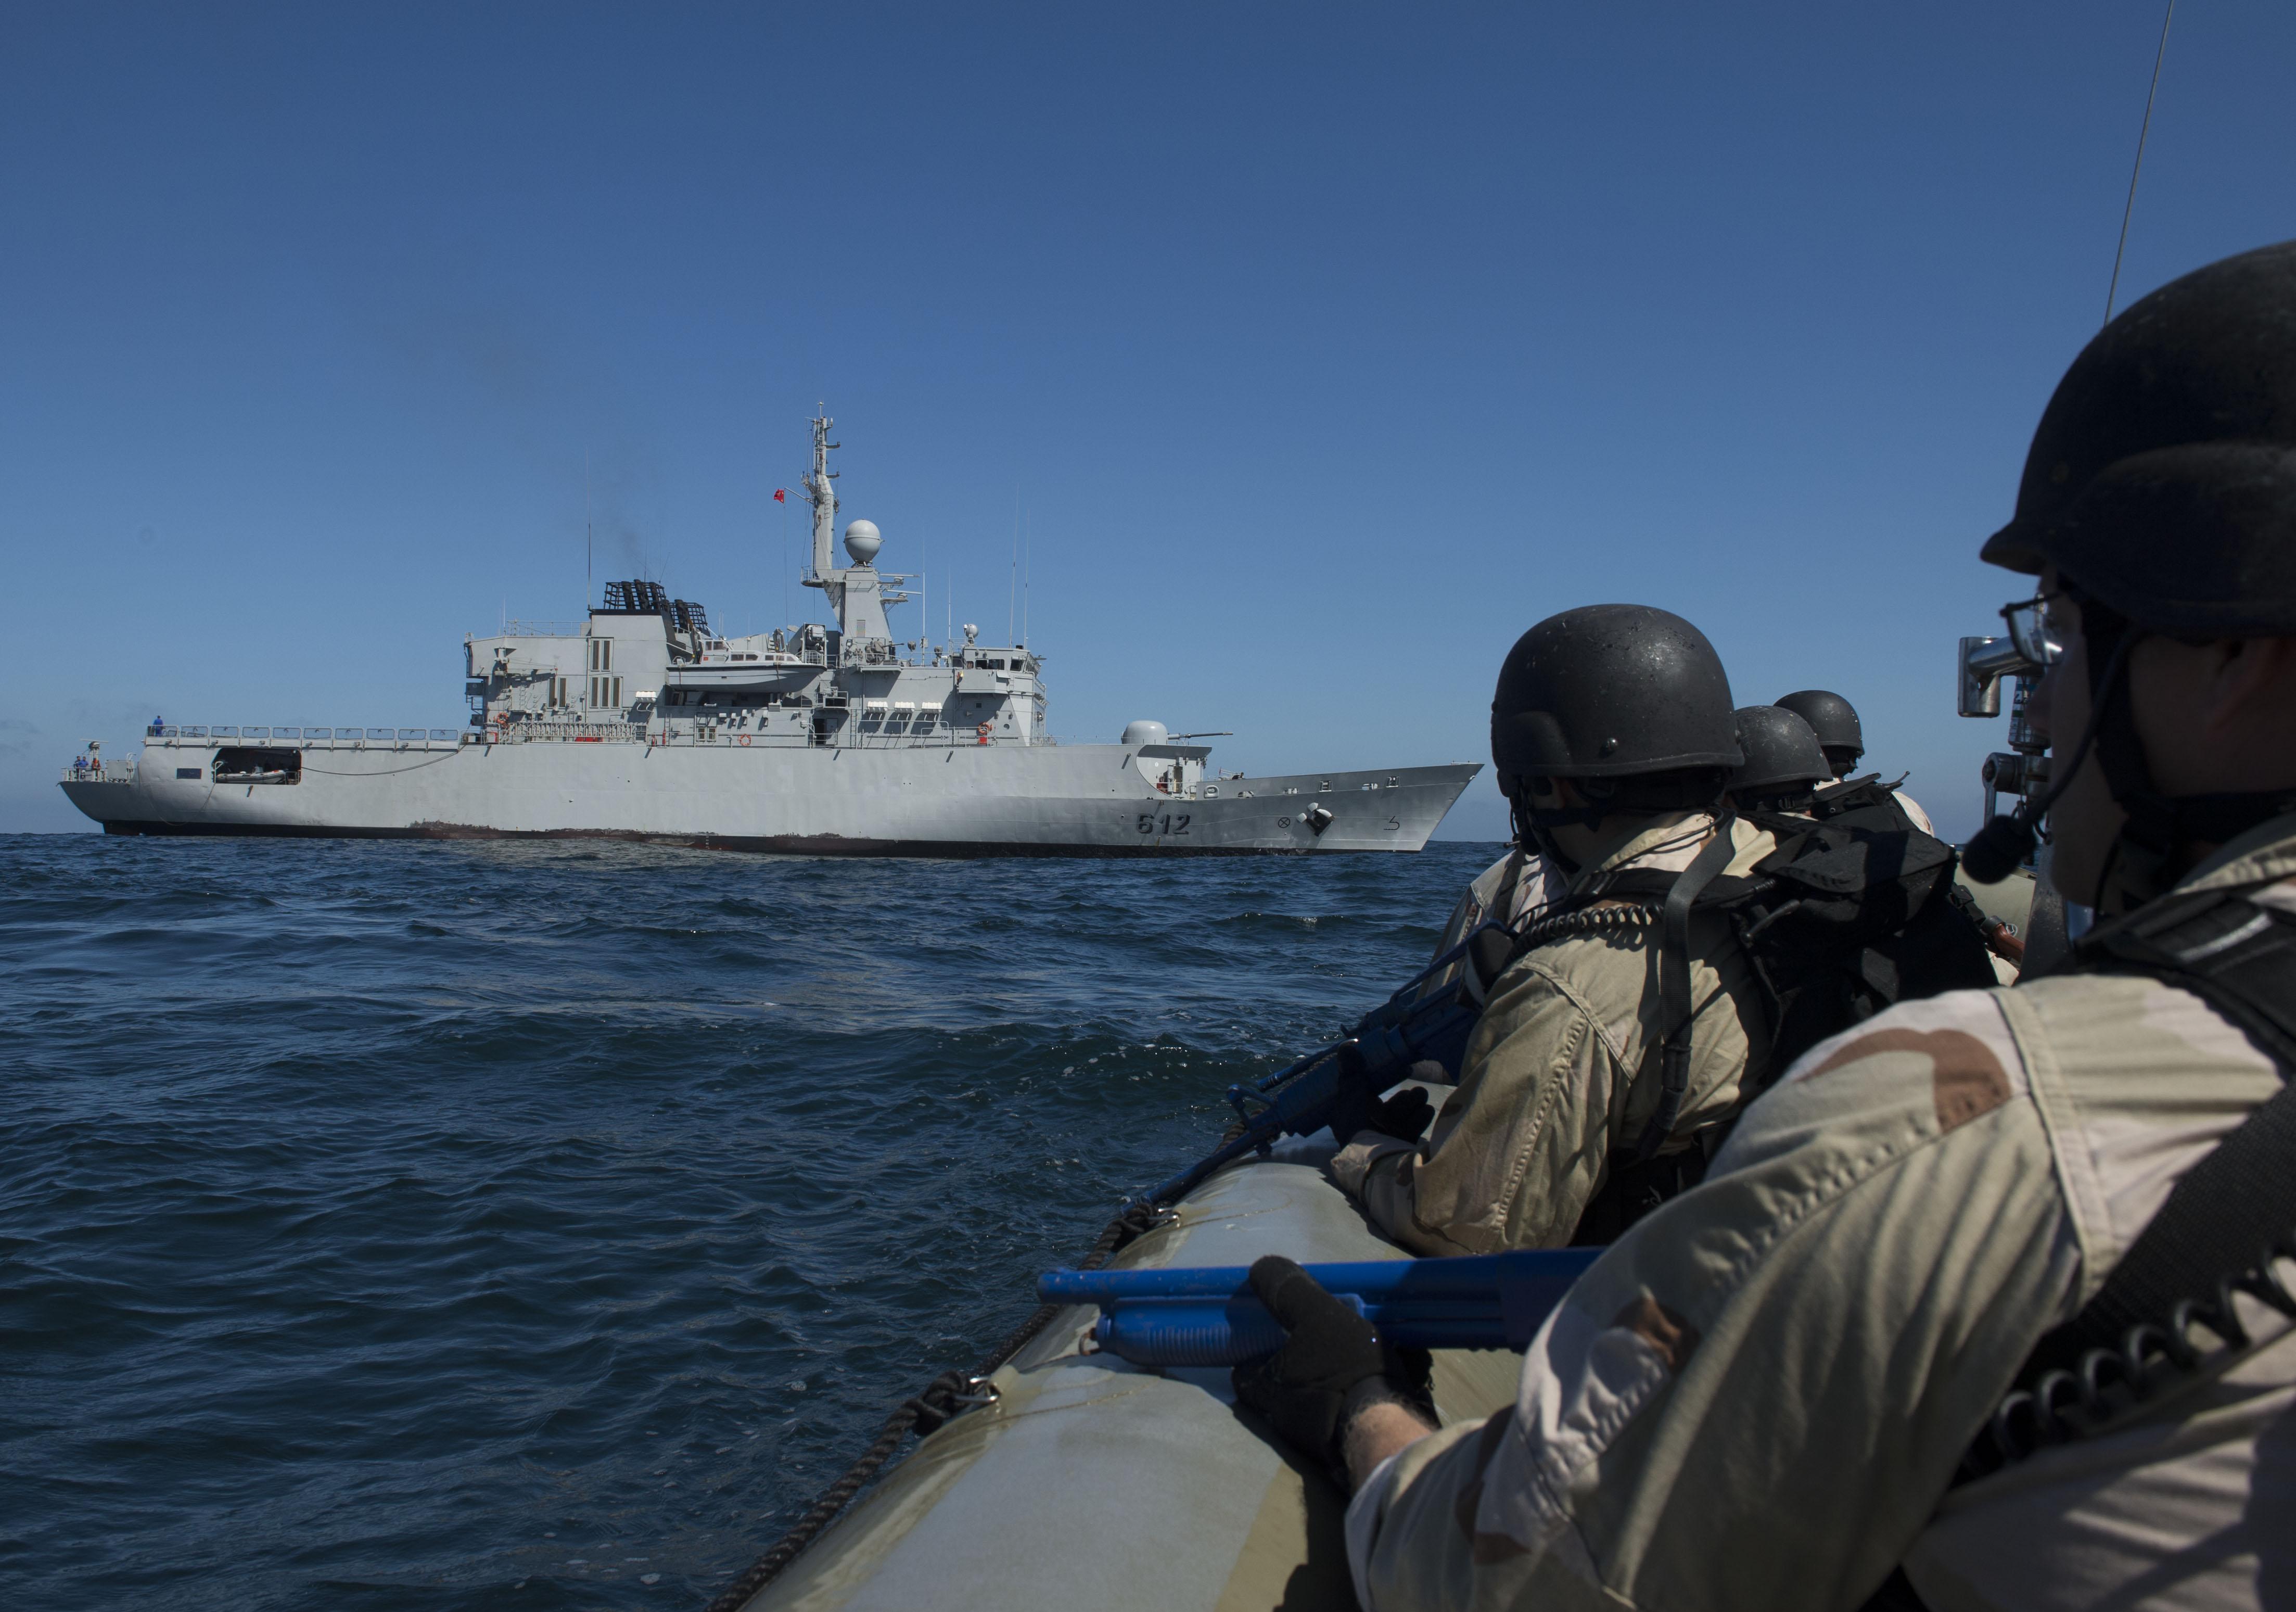 PASSEX 2014-3 : USS Simpson ( FFG56 ) et RMN Hassan II ( 612 ) 12990020625_c0aee5ea34_o